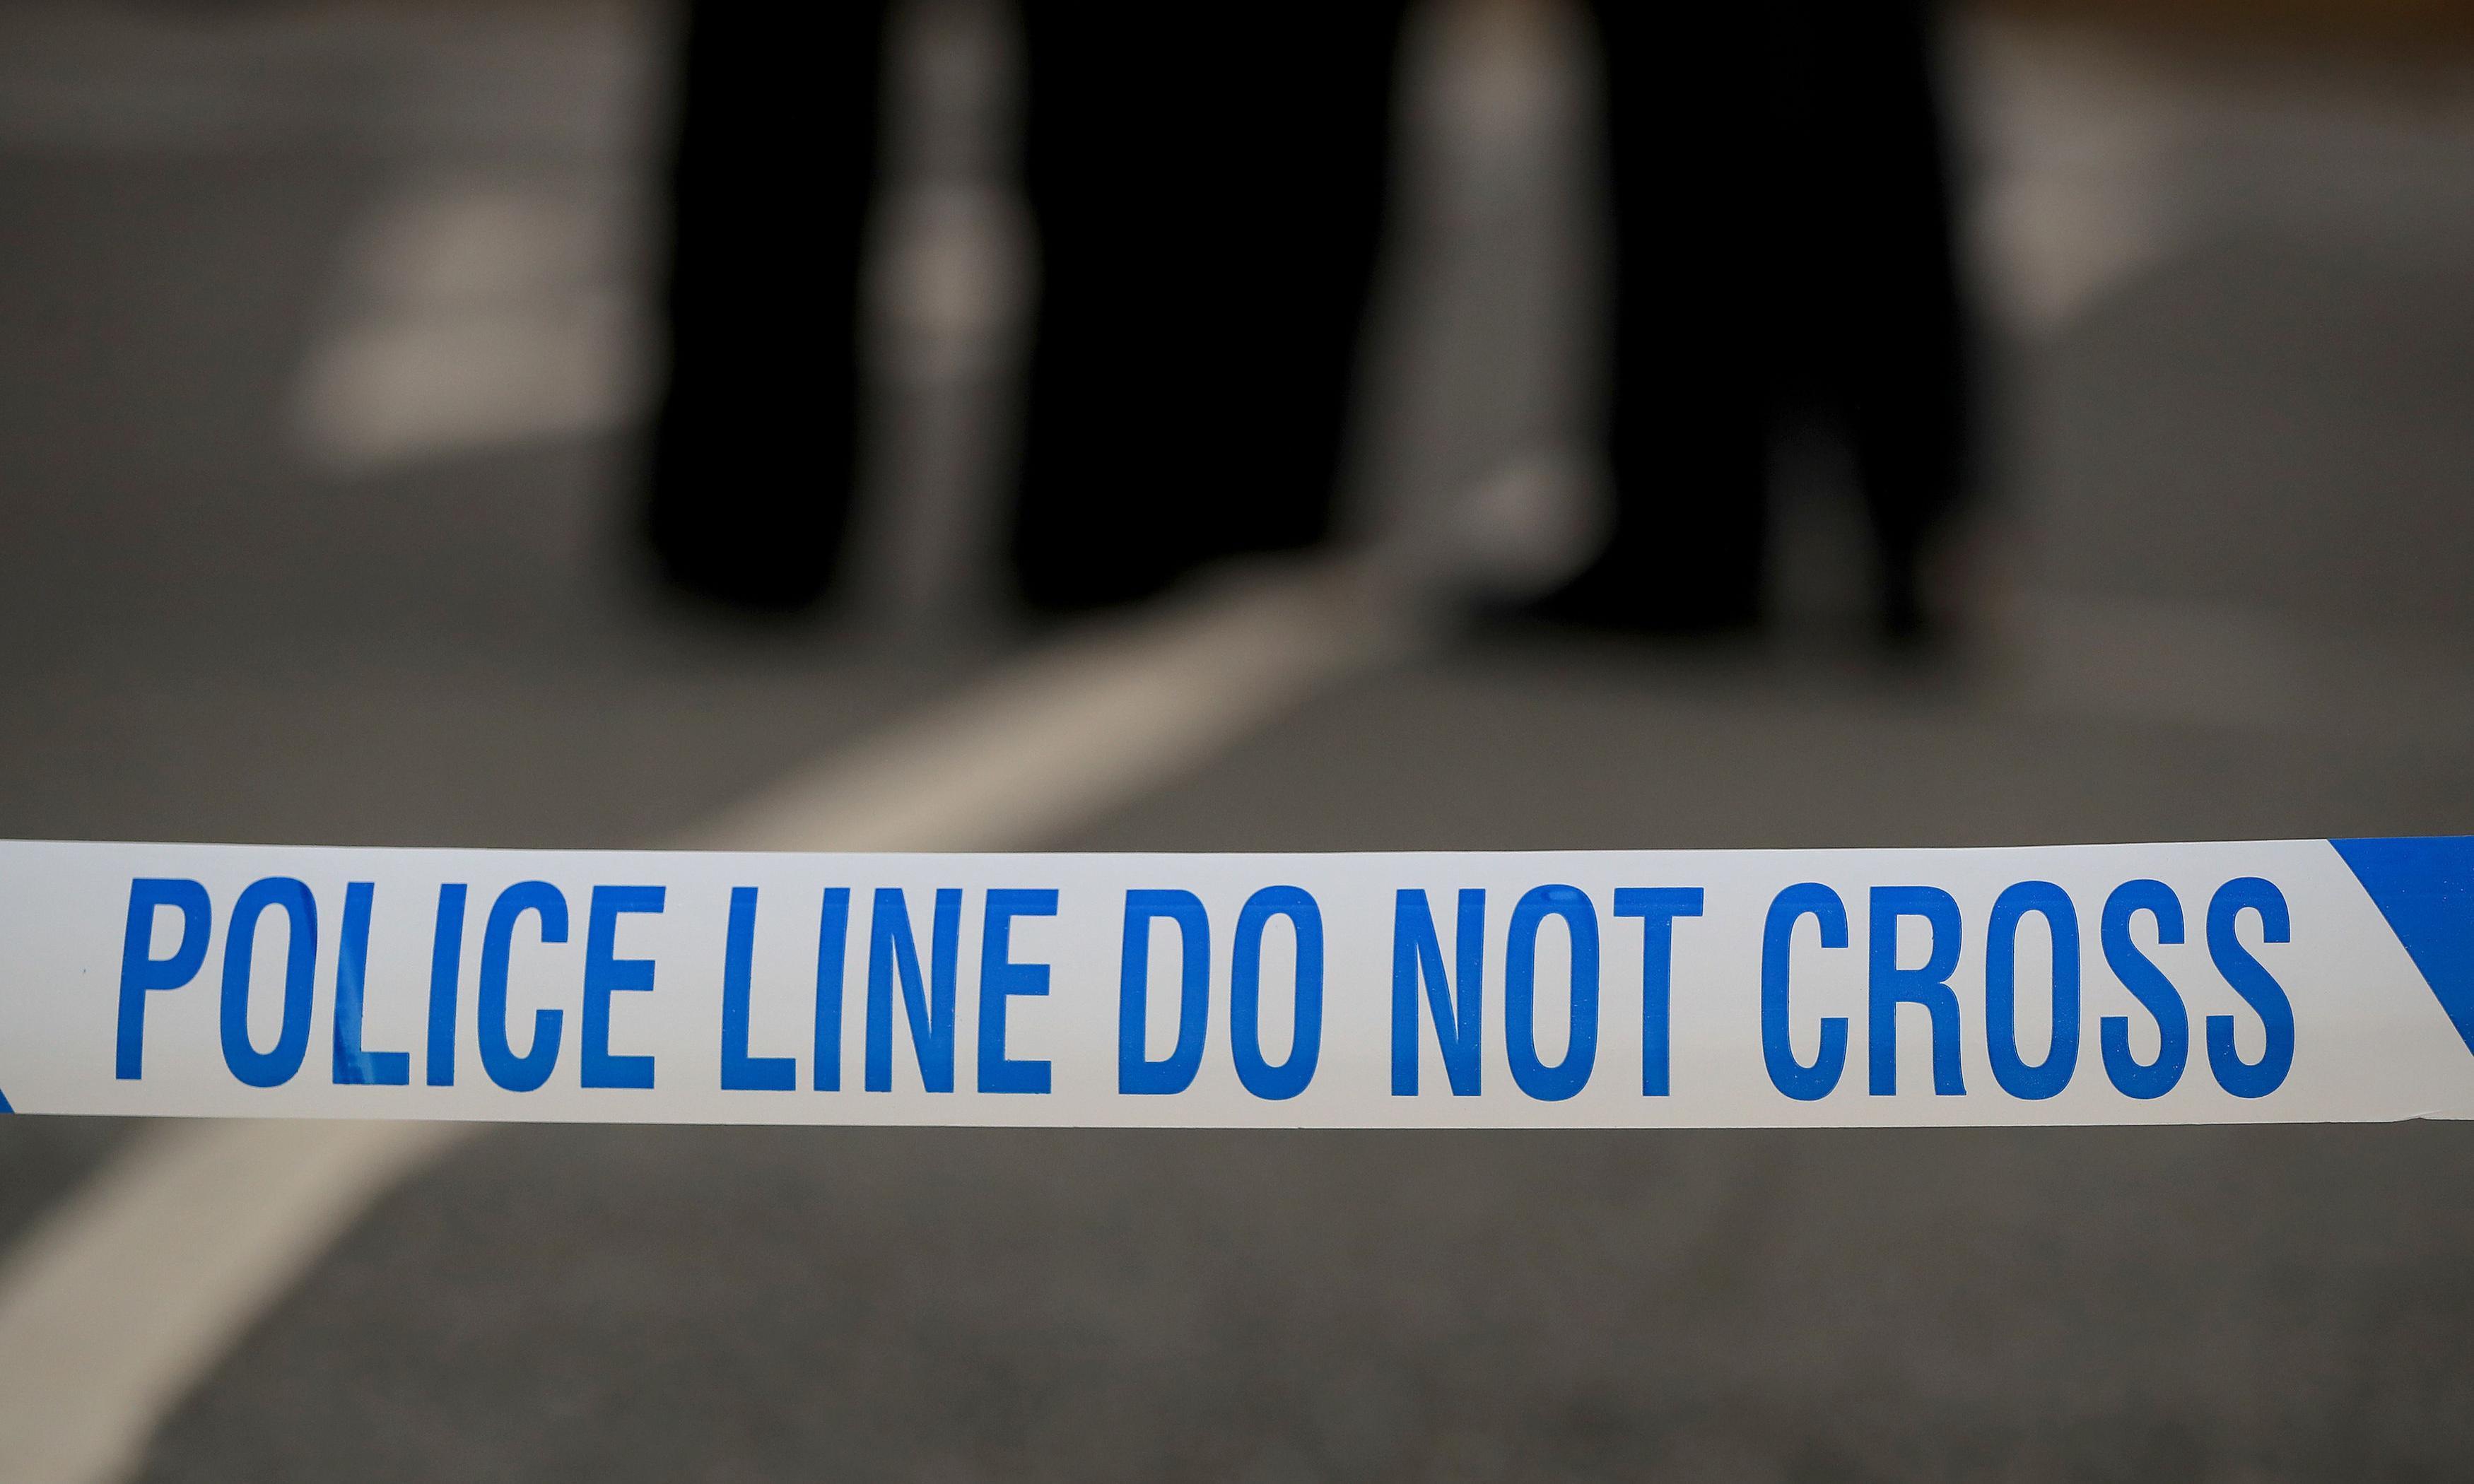 Eleven held on suspicion of murder after London stabbing